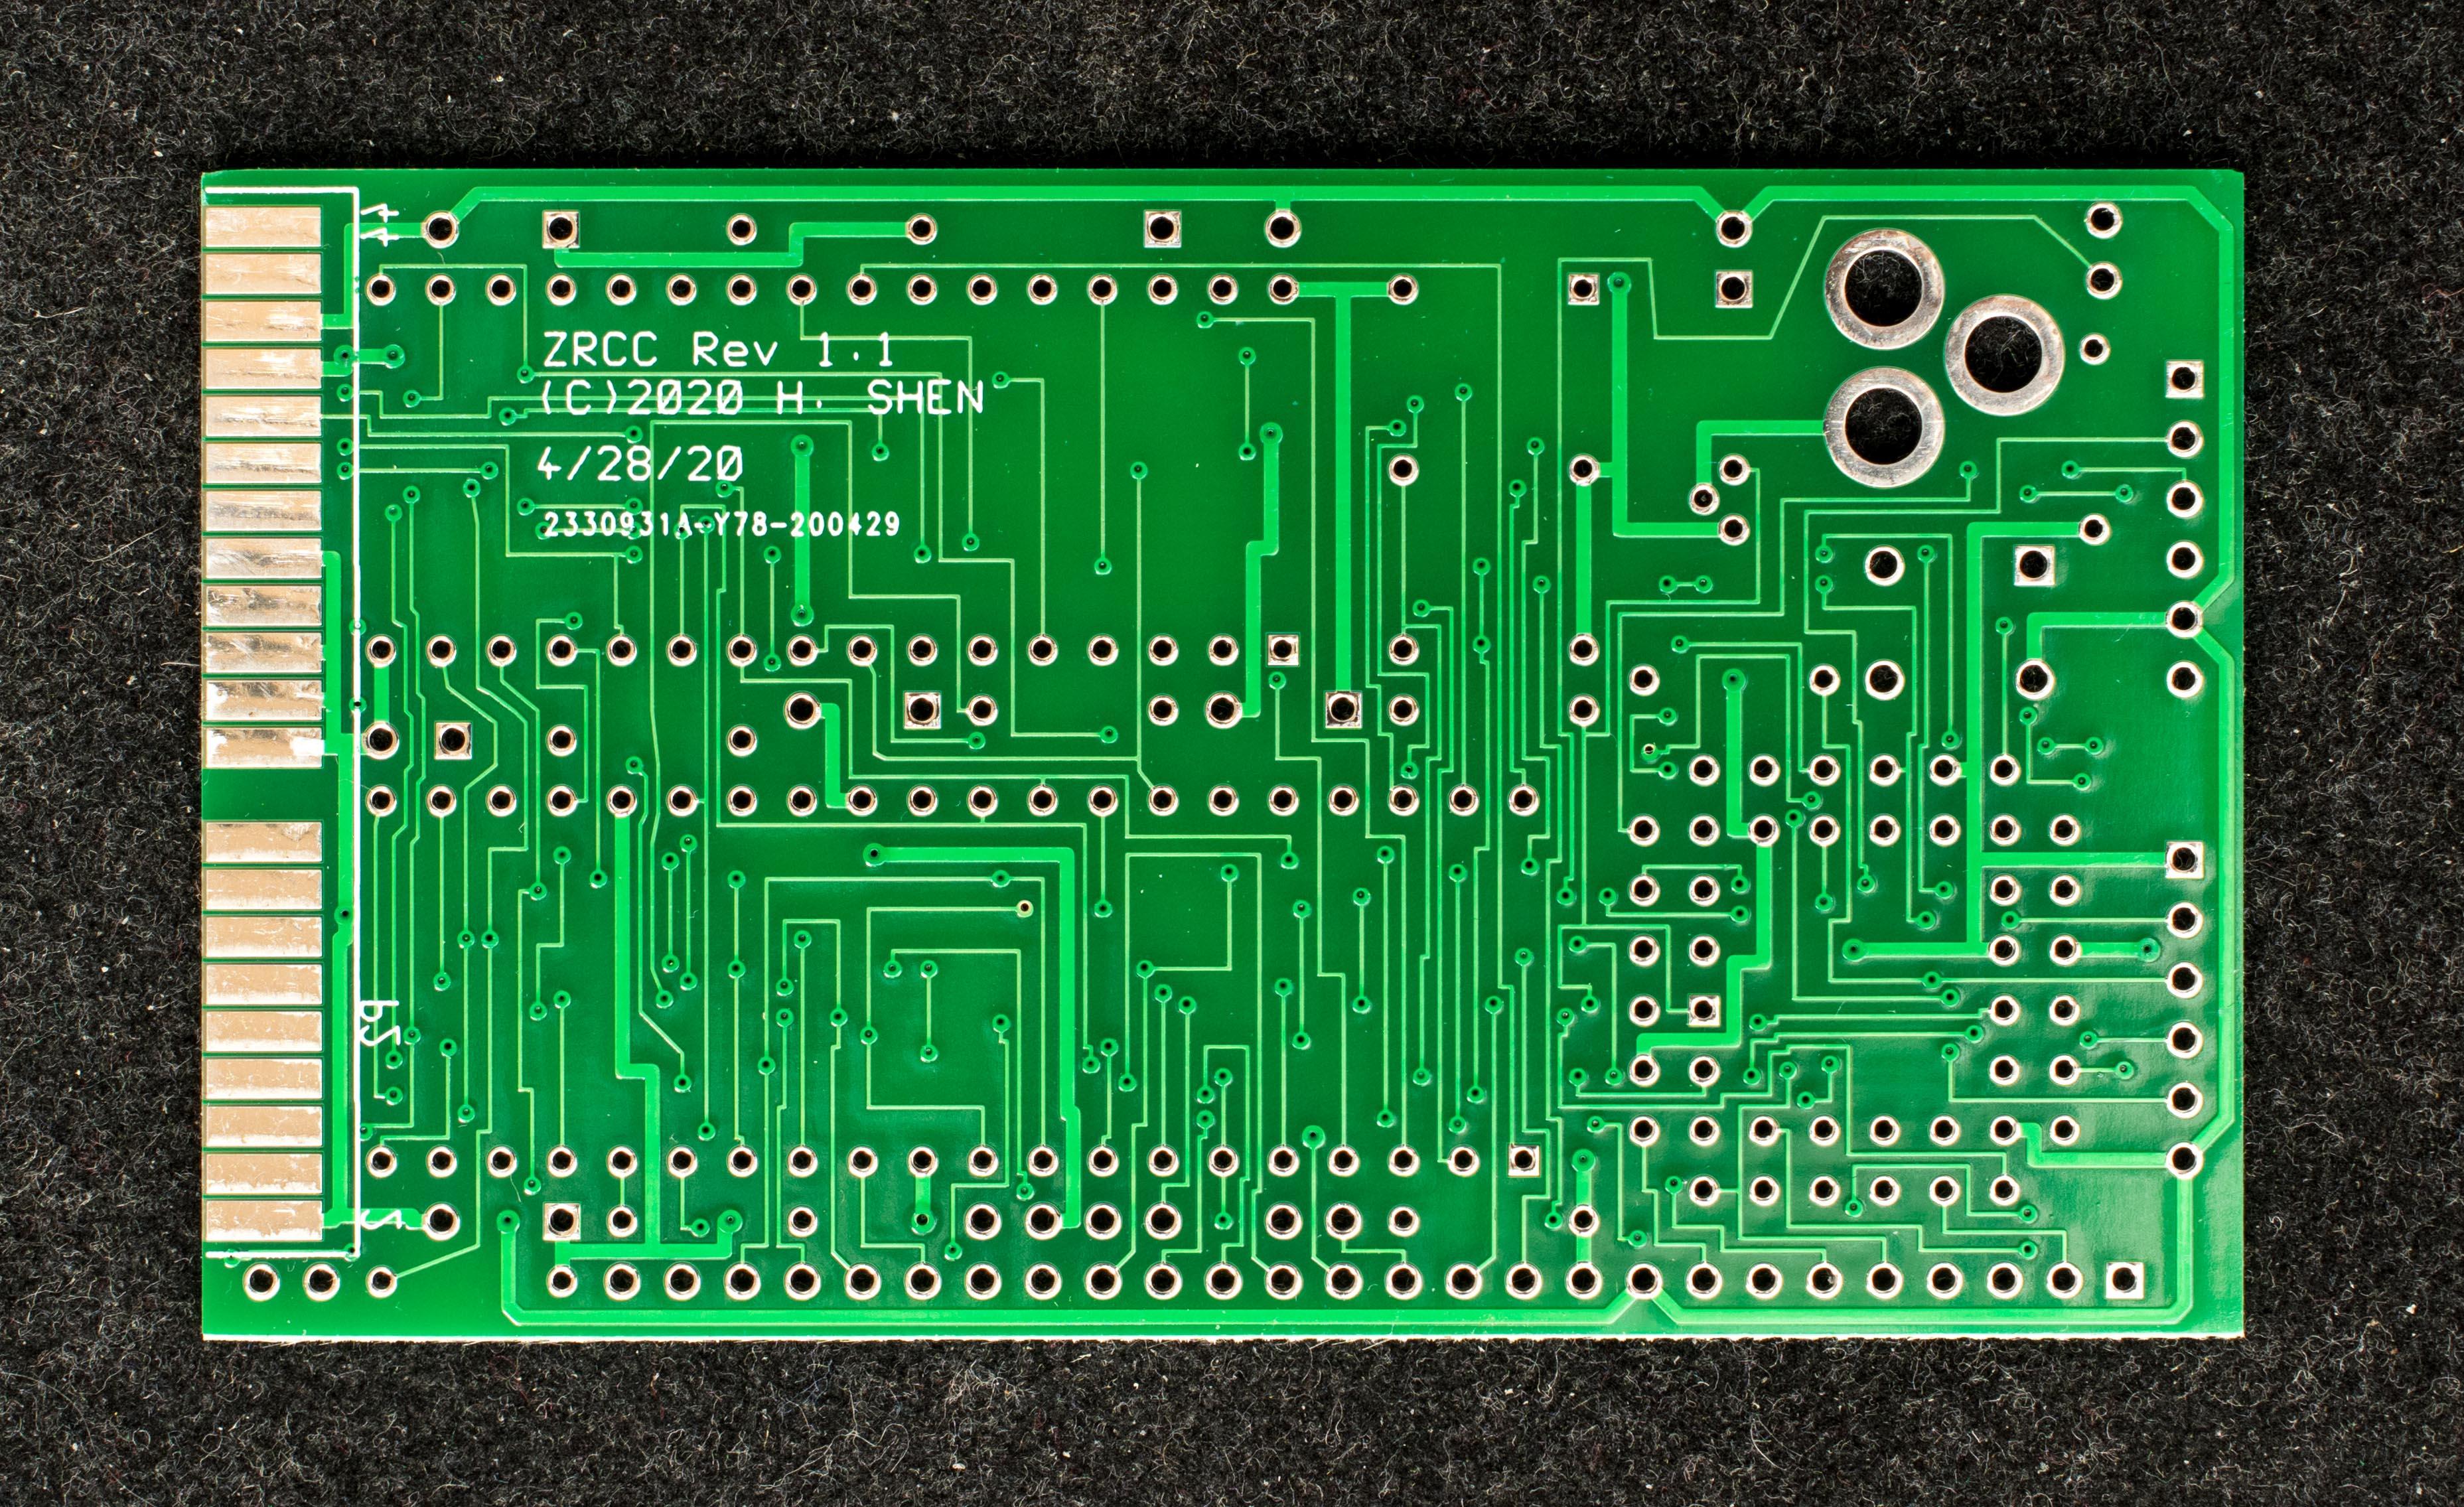 www.retrobrewcomputers.org_lib_plugins_ckgedit_fckeditor_userfiles_image_builderpages_plasmo_zrcc_zrcc1_zrcc_v11_solder.jpg